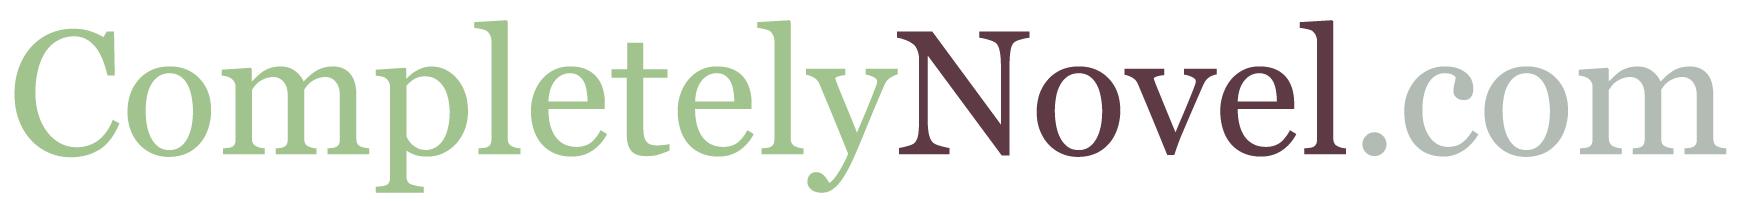 completly novel logo